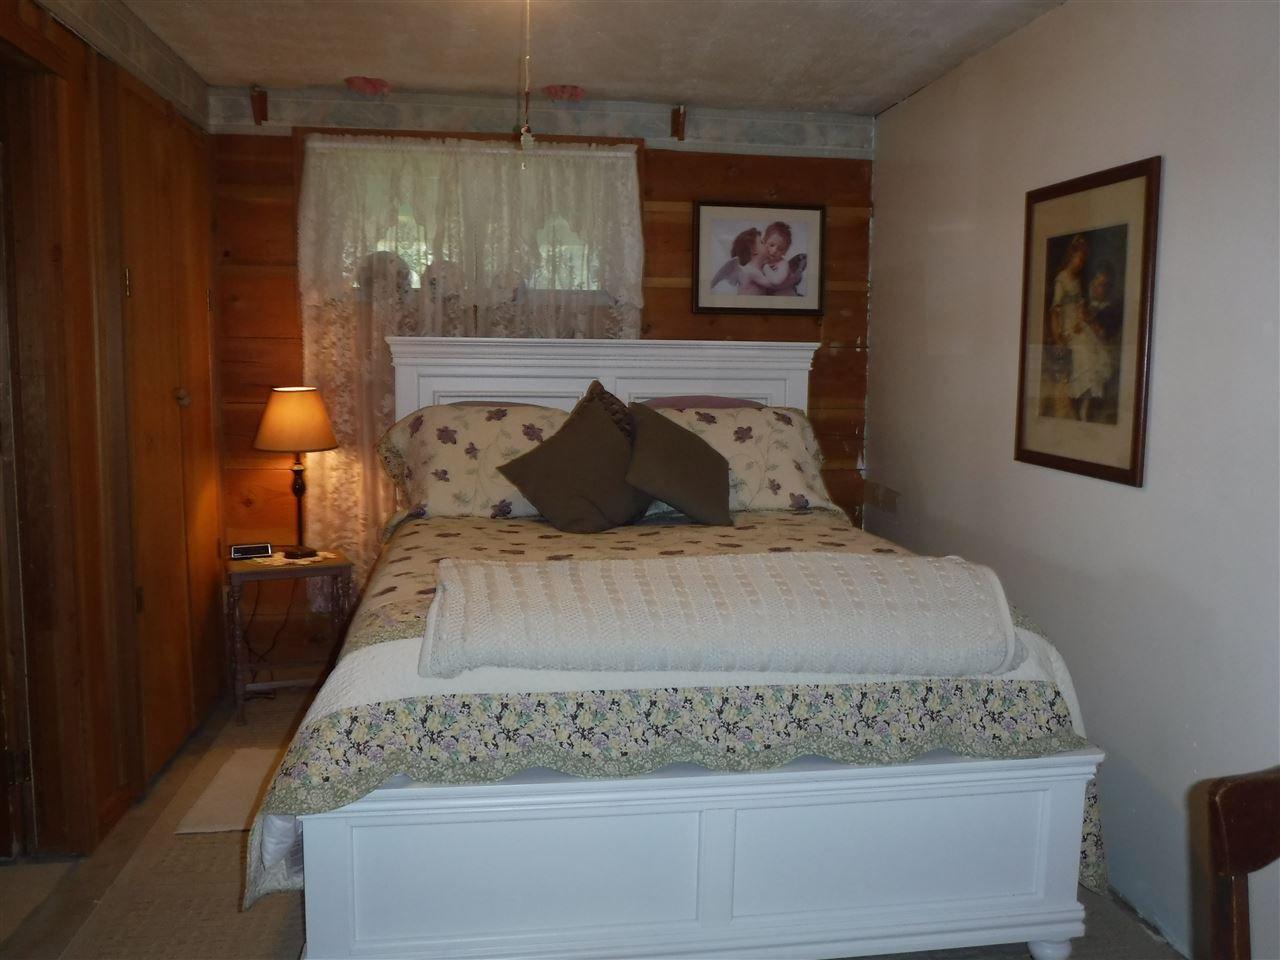 Photo 32: Photos: 3126 ELSEY Road in Williams Lake: Williams Lake - Rural West House for sale (Williams Lake (Zone 27))  : MLS®# R2467730